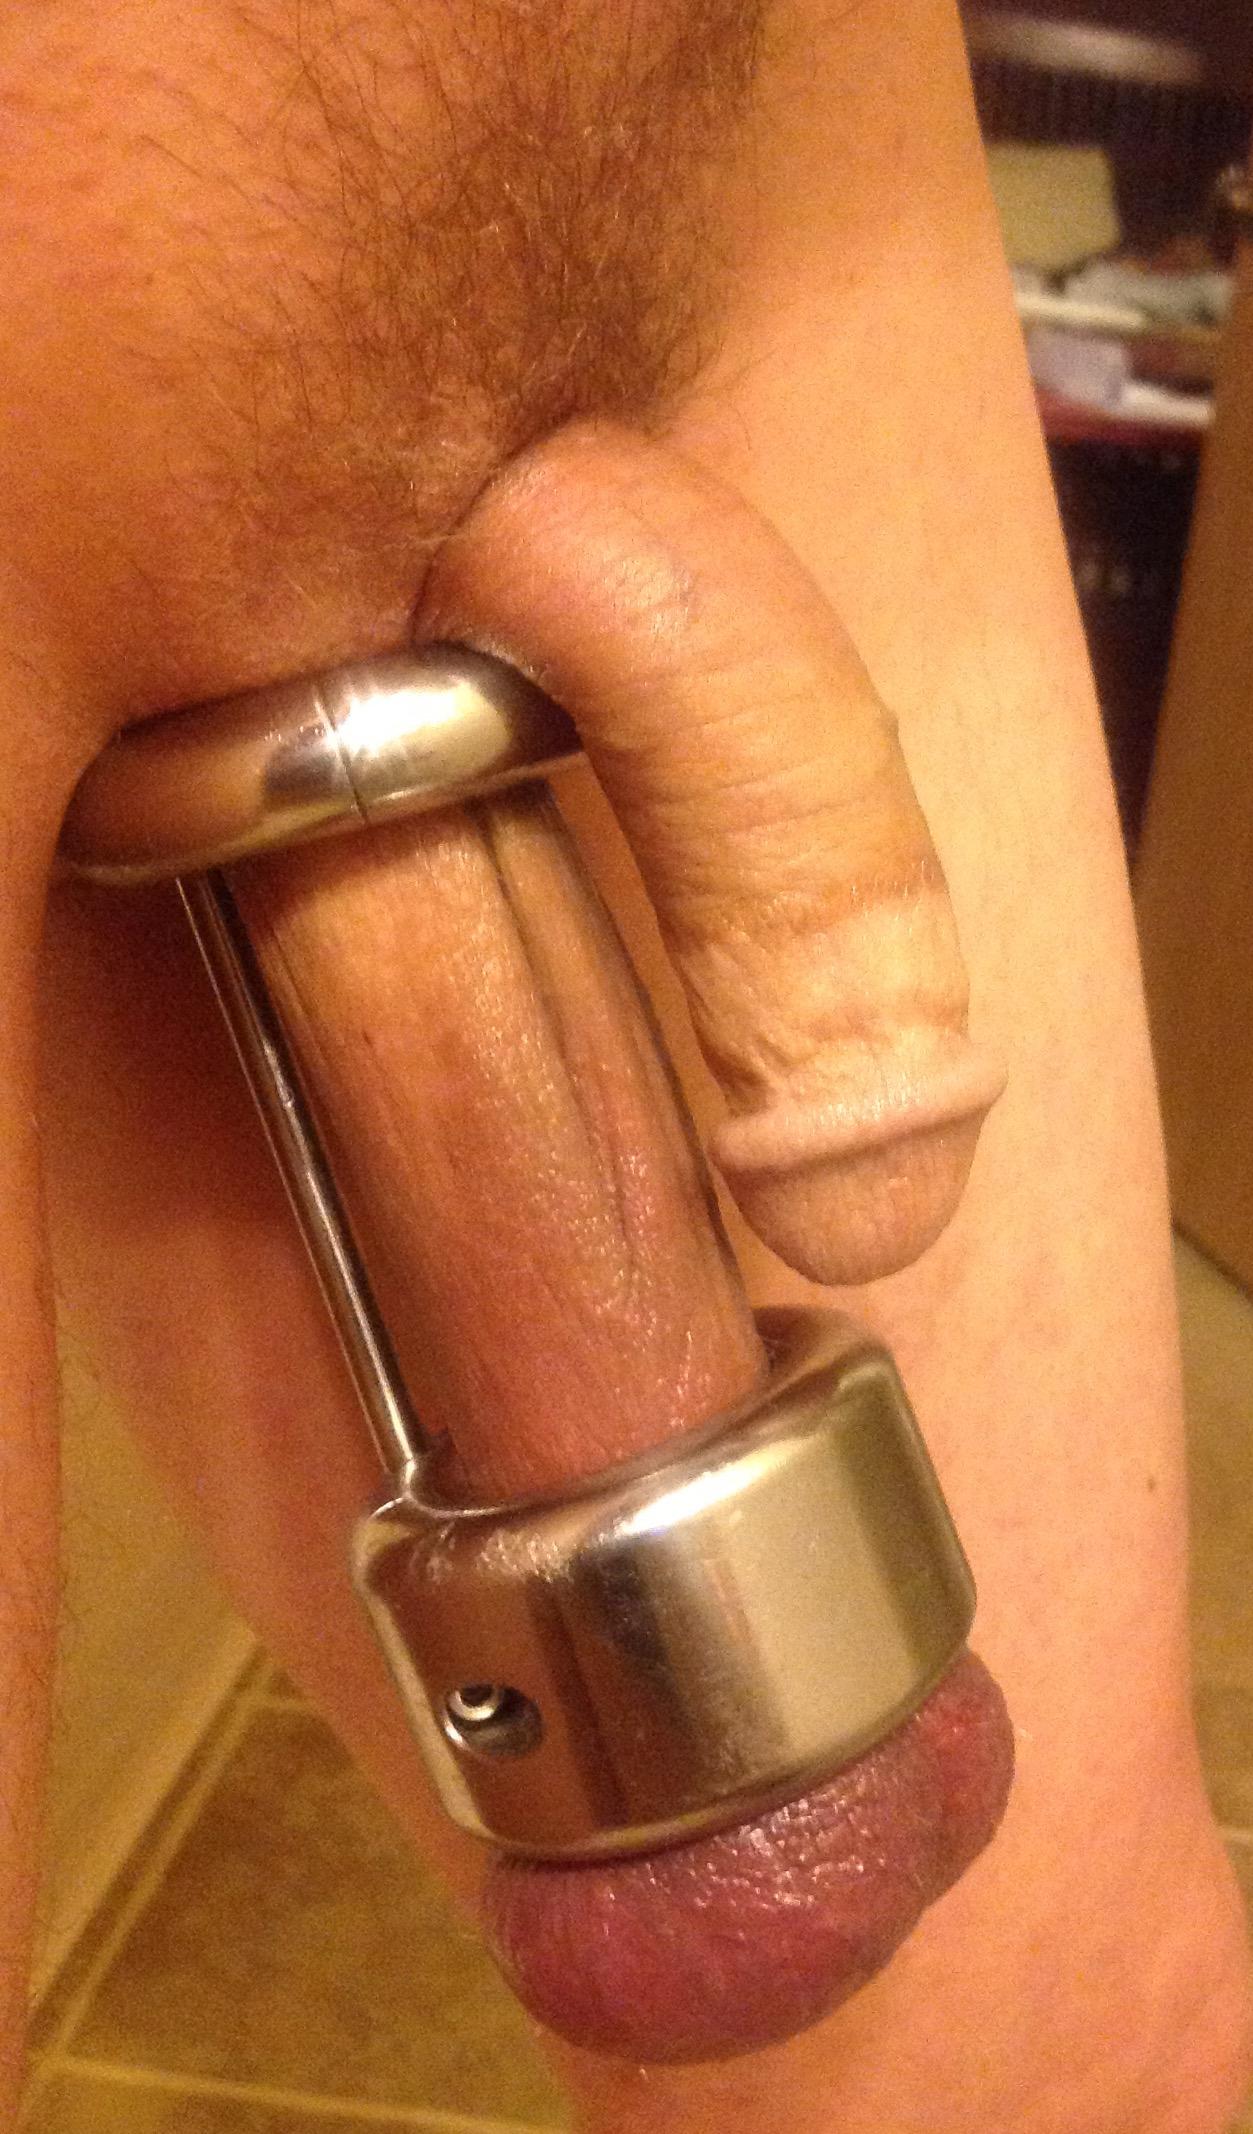 Dnd hulk electro penis enlargement pump